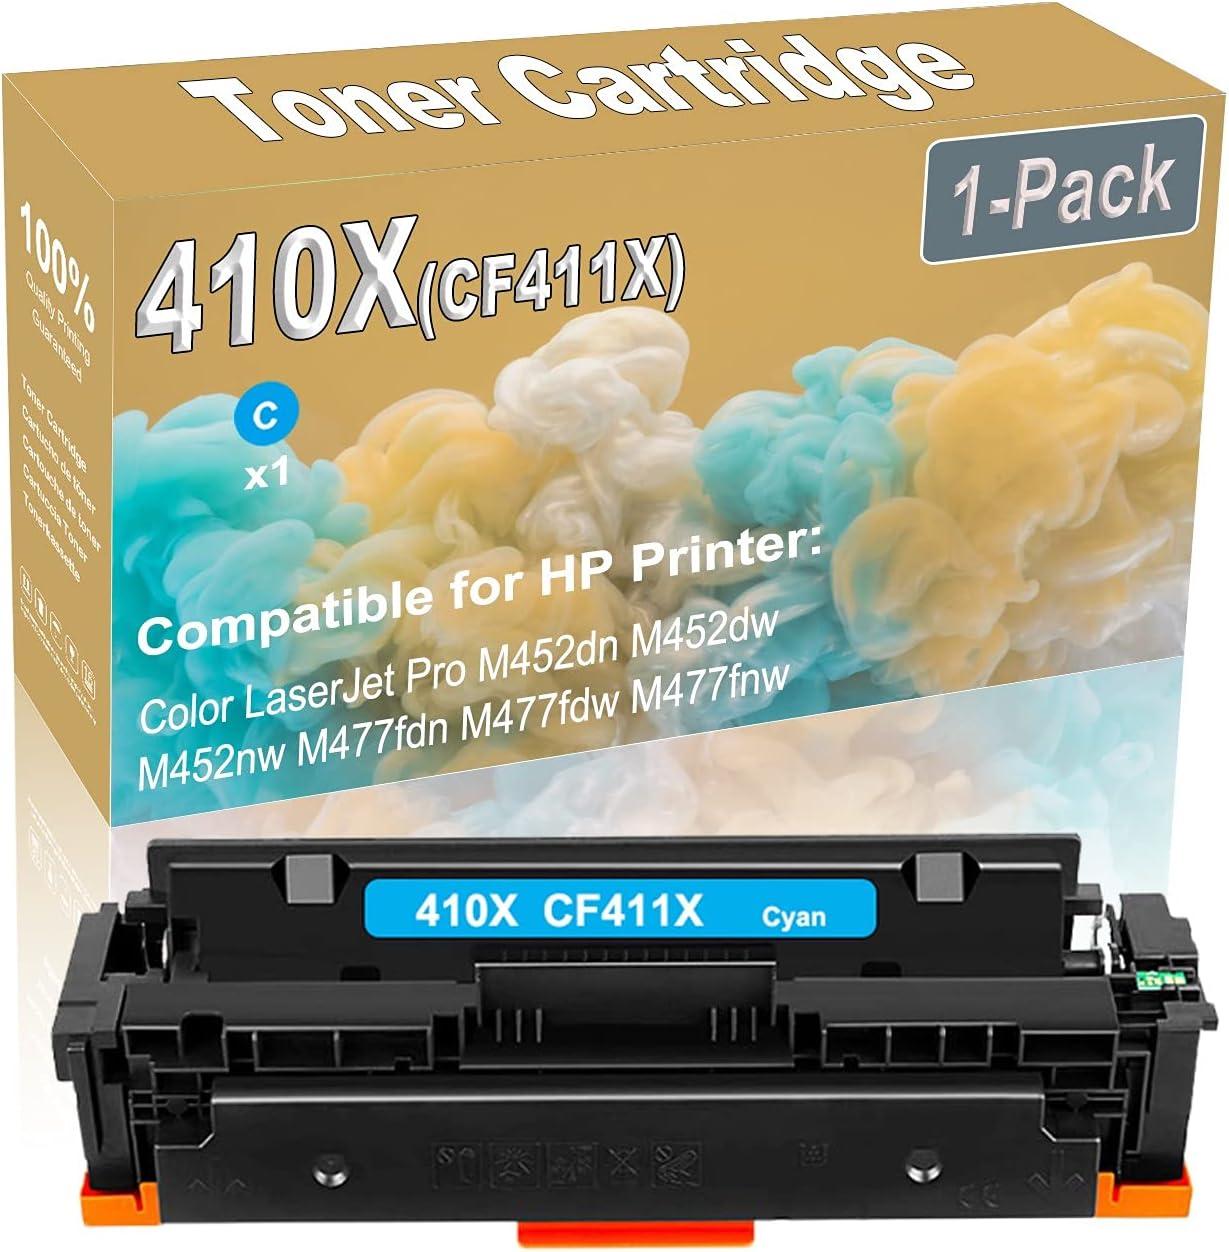 1-Pack (Cyan) Compatible High Yield 410X (CF411X) Printer Toner Cartridge use for HP M452dn M452dw M452nw M477fdn M477fdw Printers